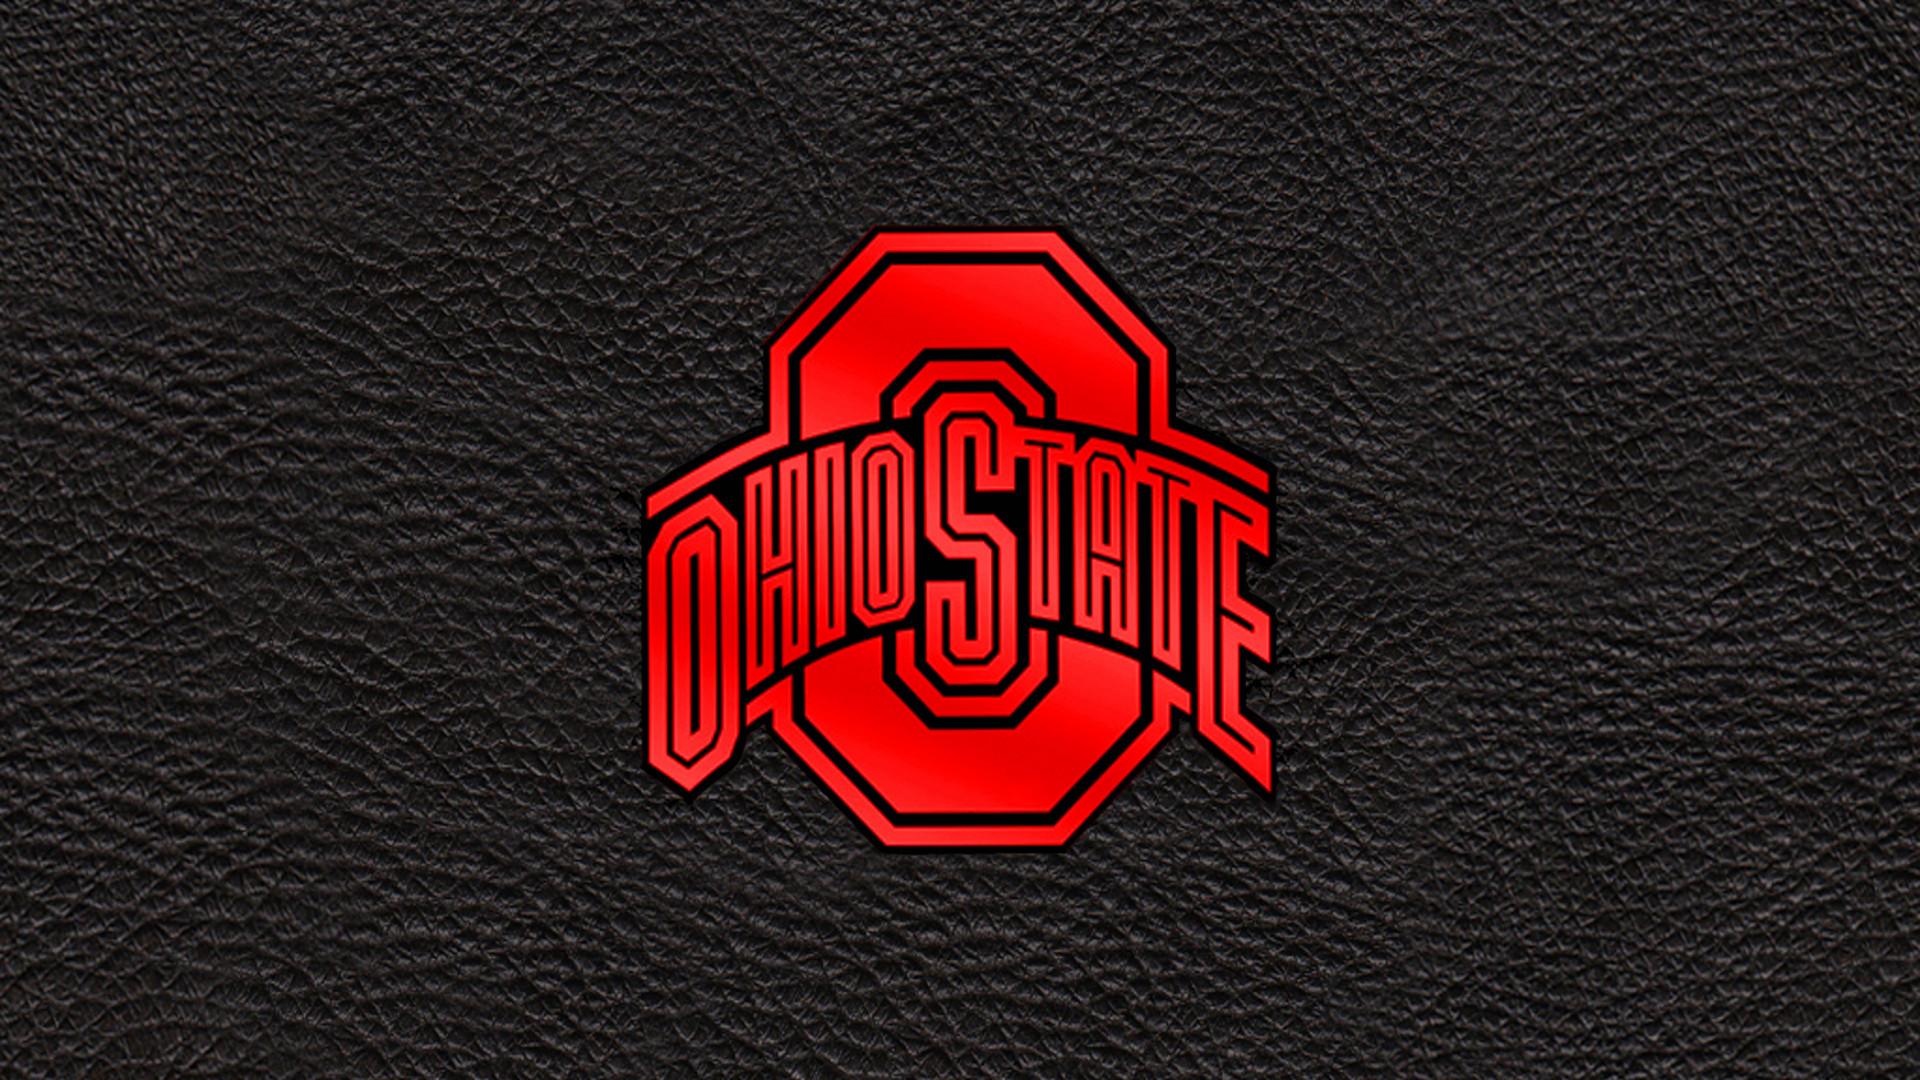 Ohio State Buckeyes.